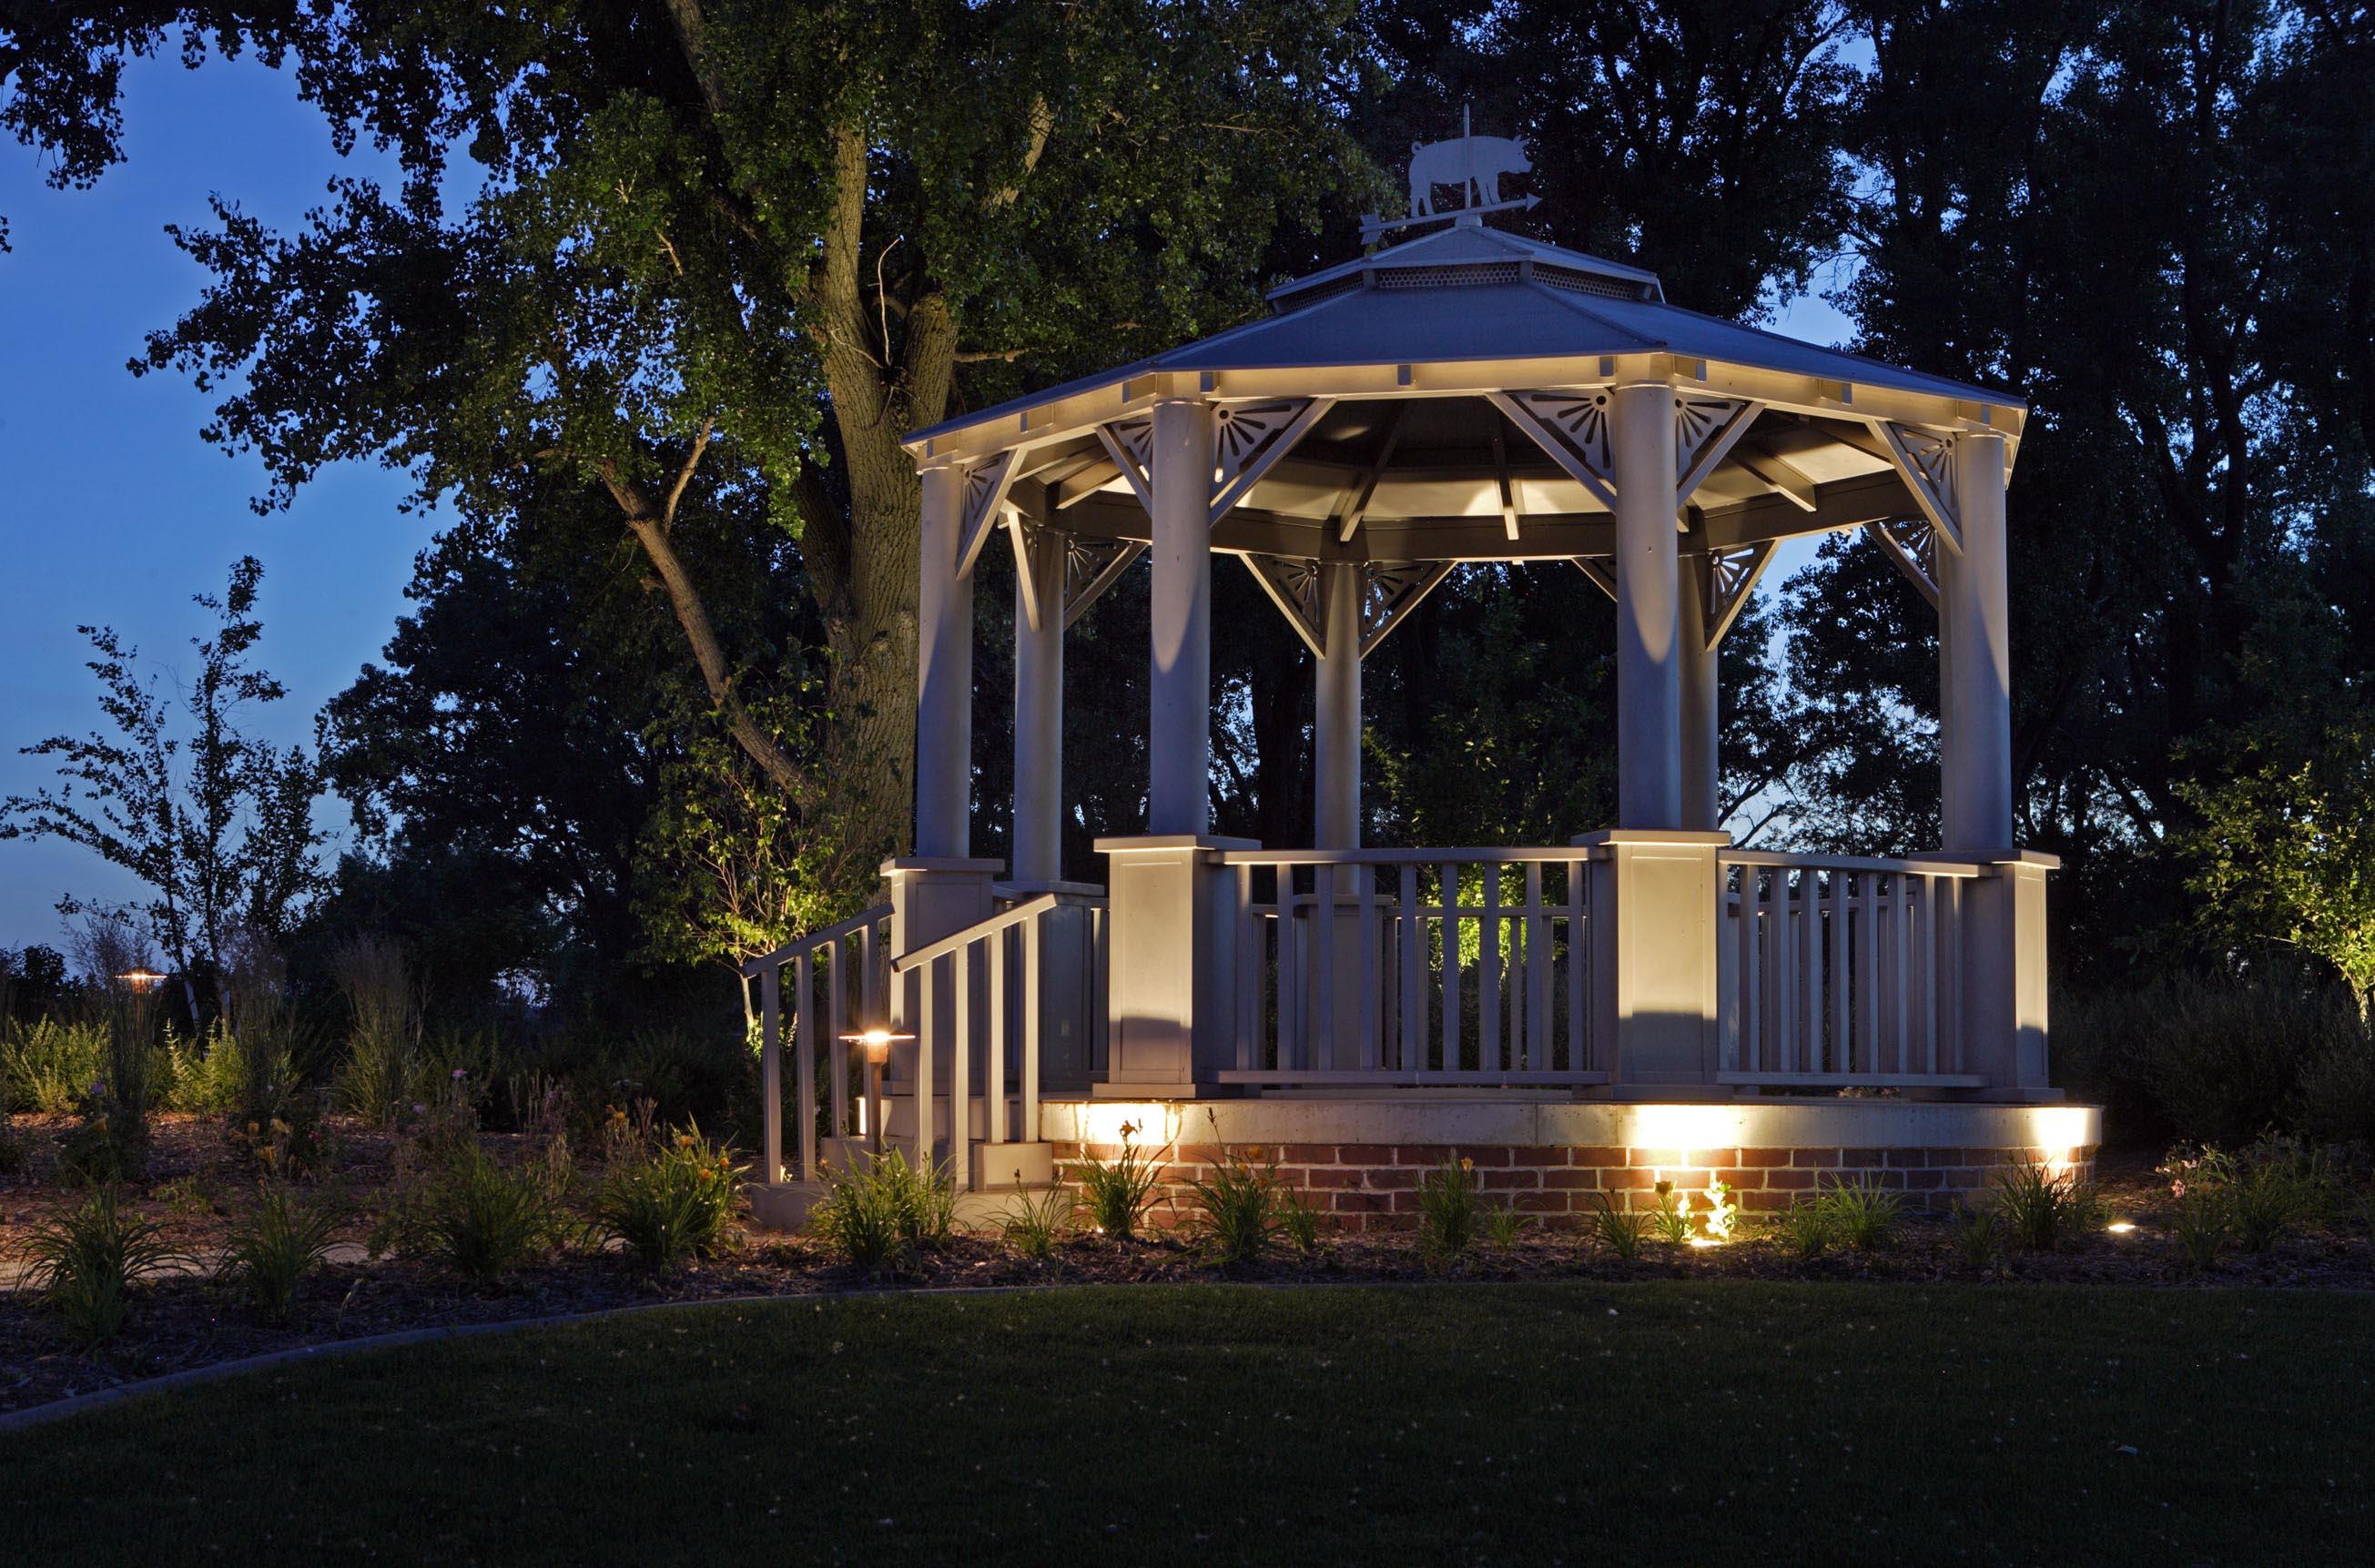 Outdoor Solar Gazebo Lights